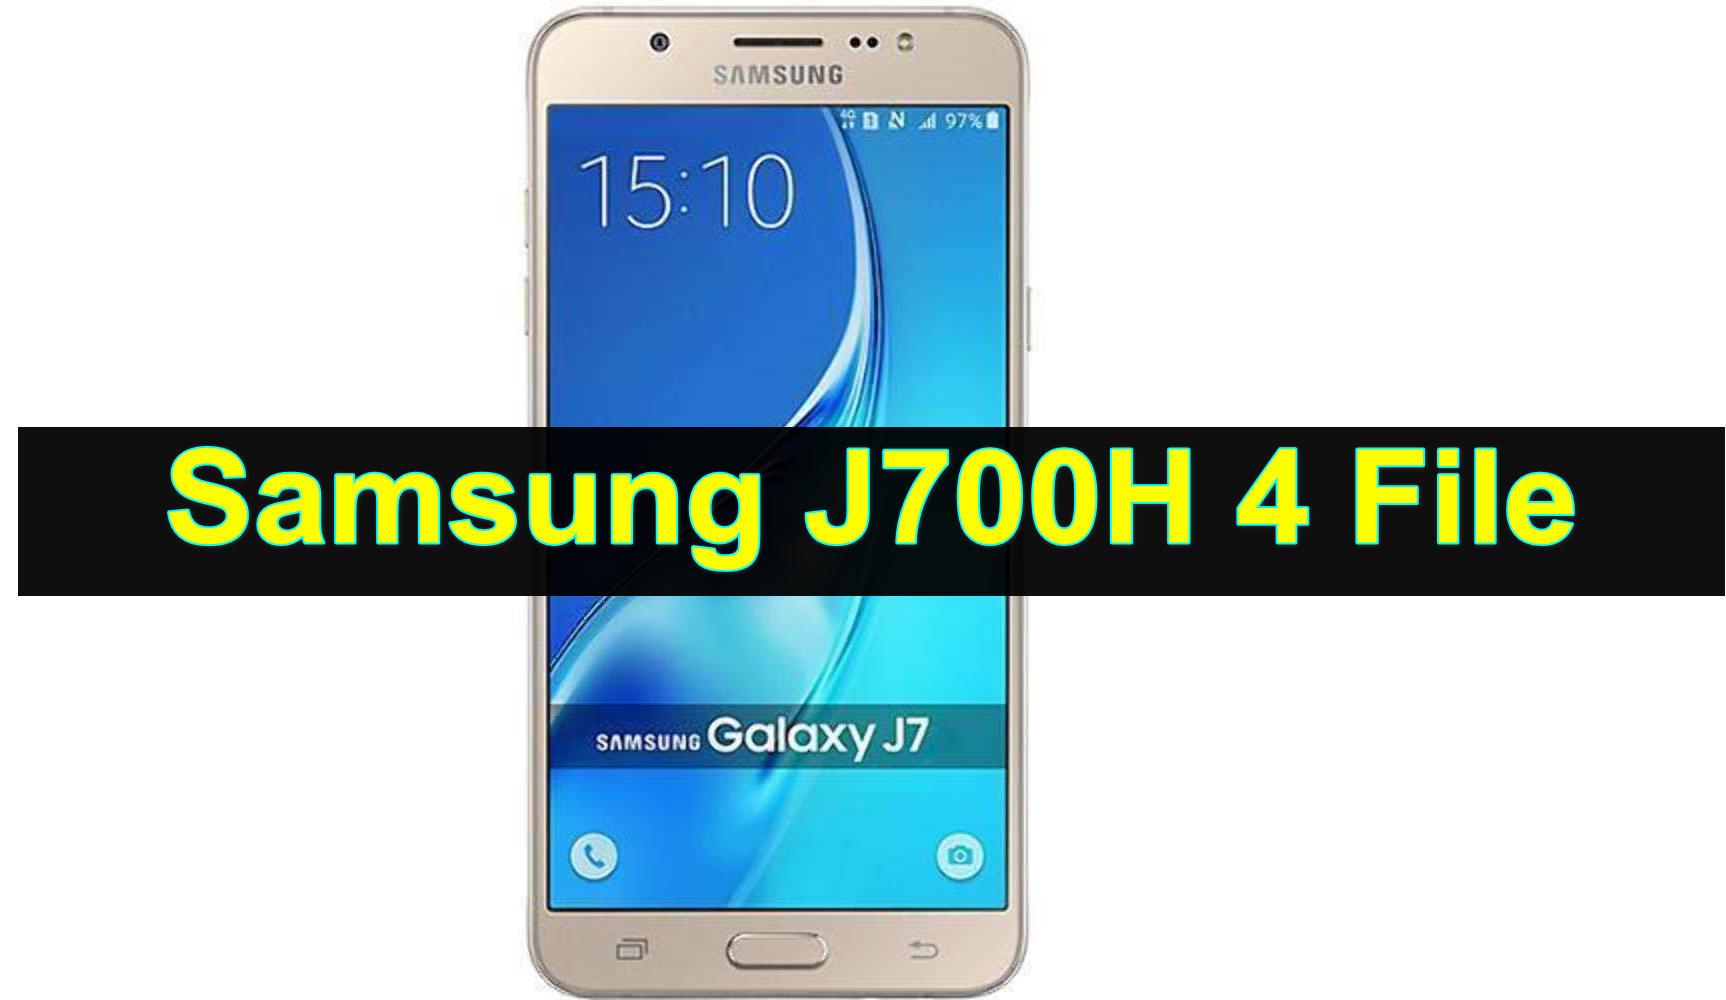 Samsung J700H 4 File